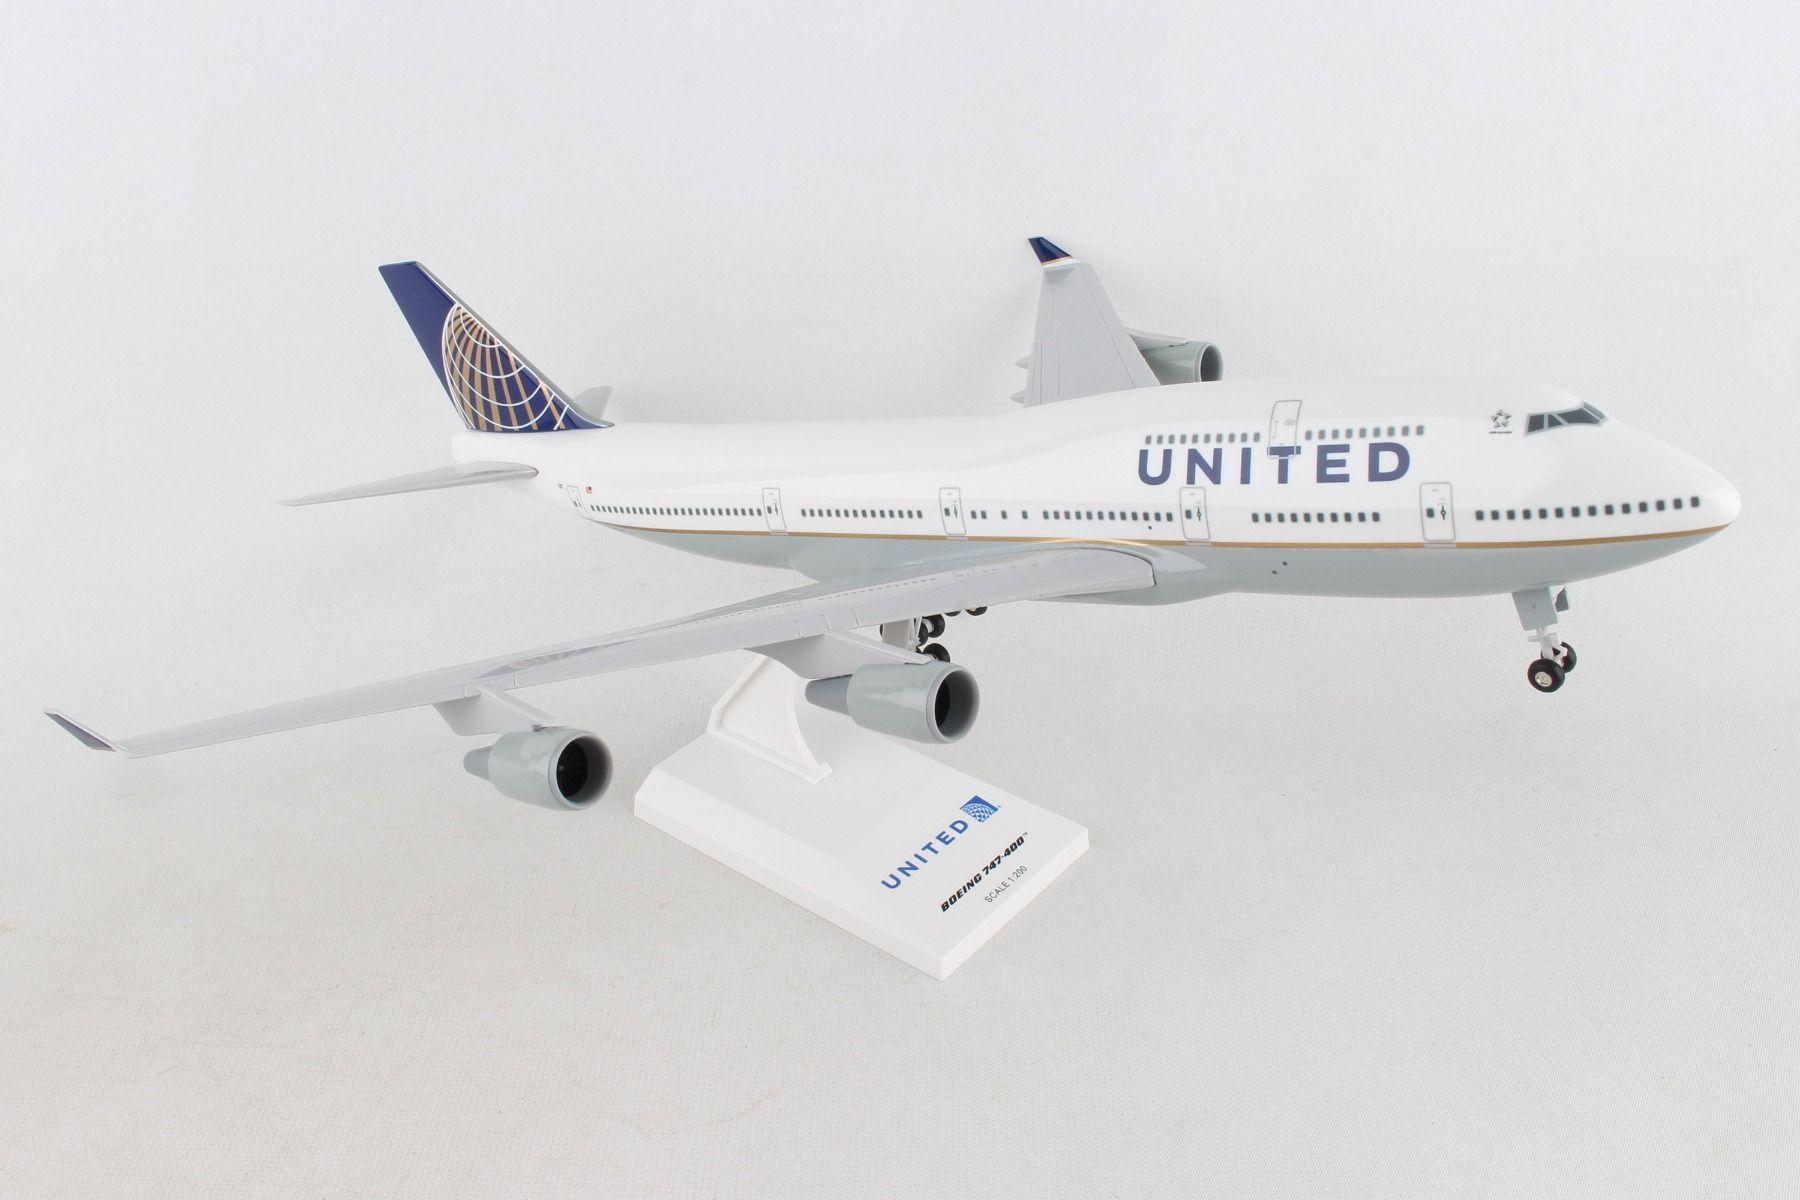 Skymarks United Airlines Post Co Merger Boeing 747-400 1:200 SKR614